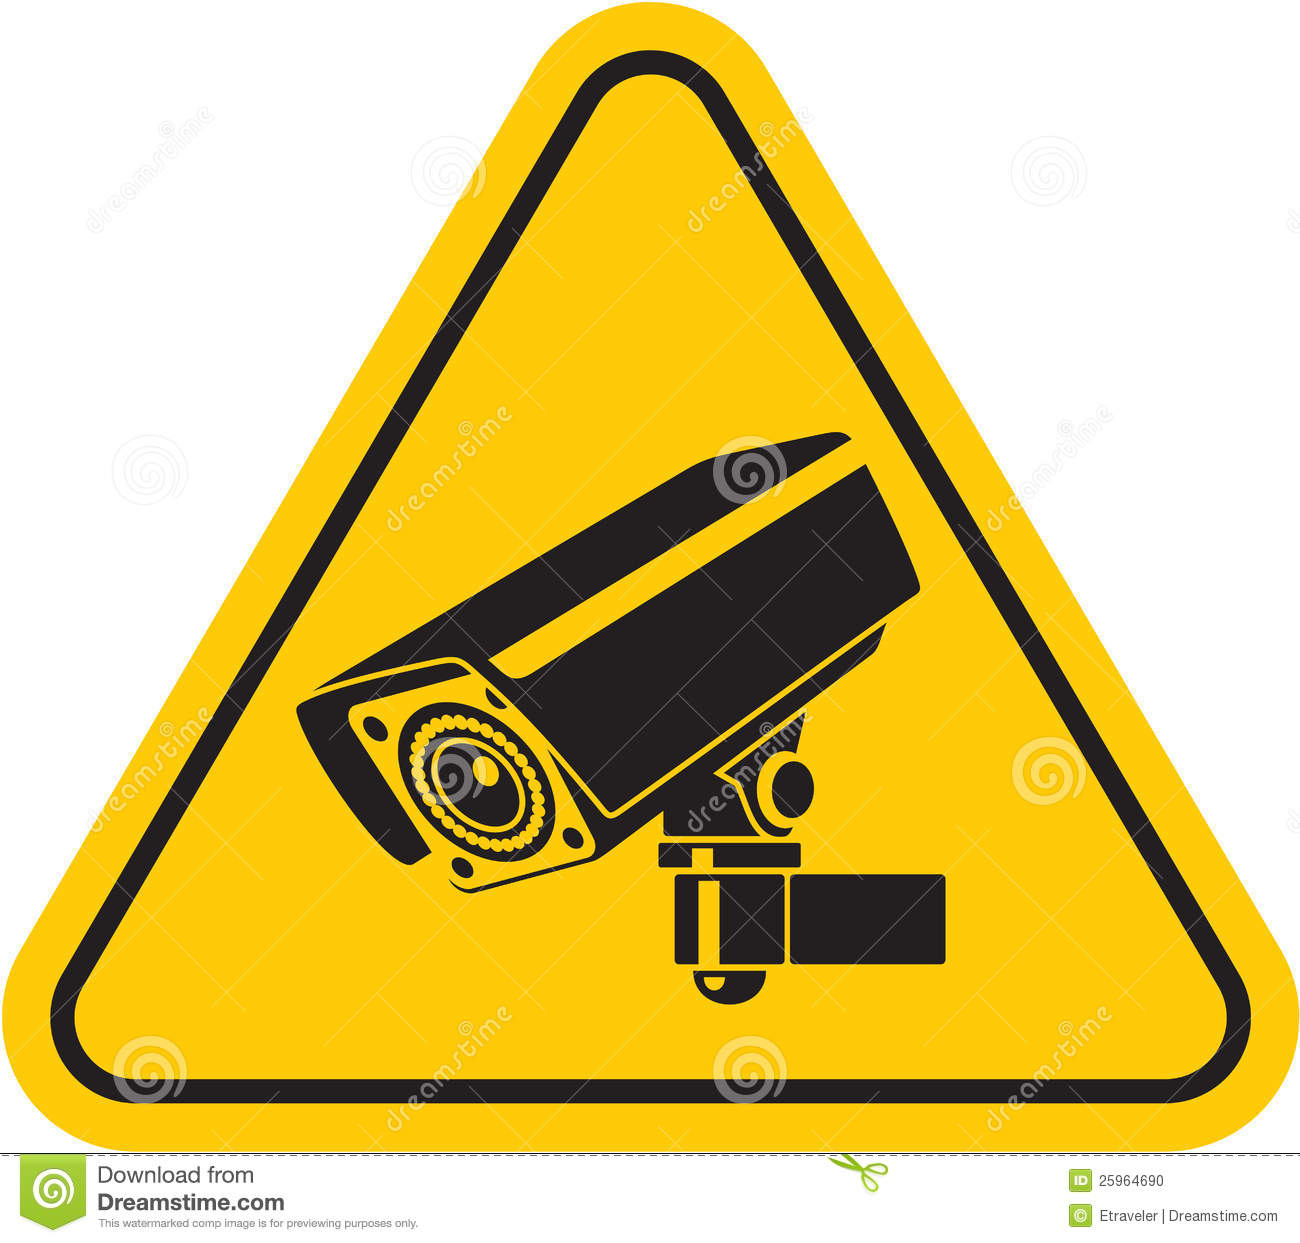 Surveillance clipart cctv camera Images Clip Cctv clipart camera